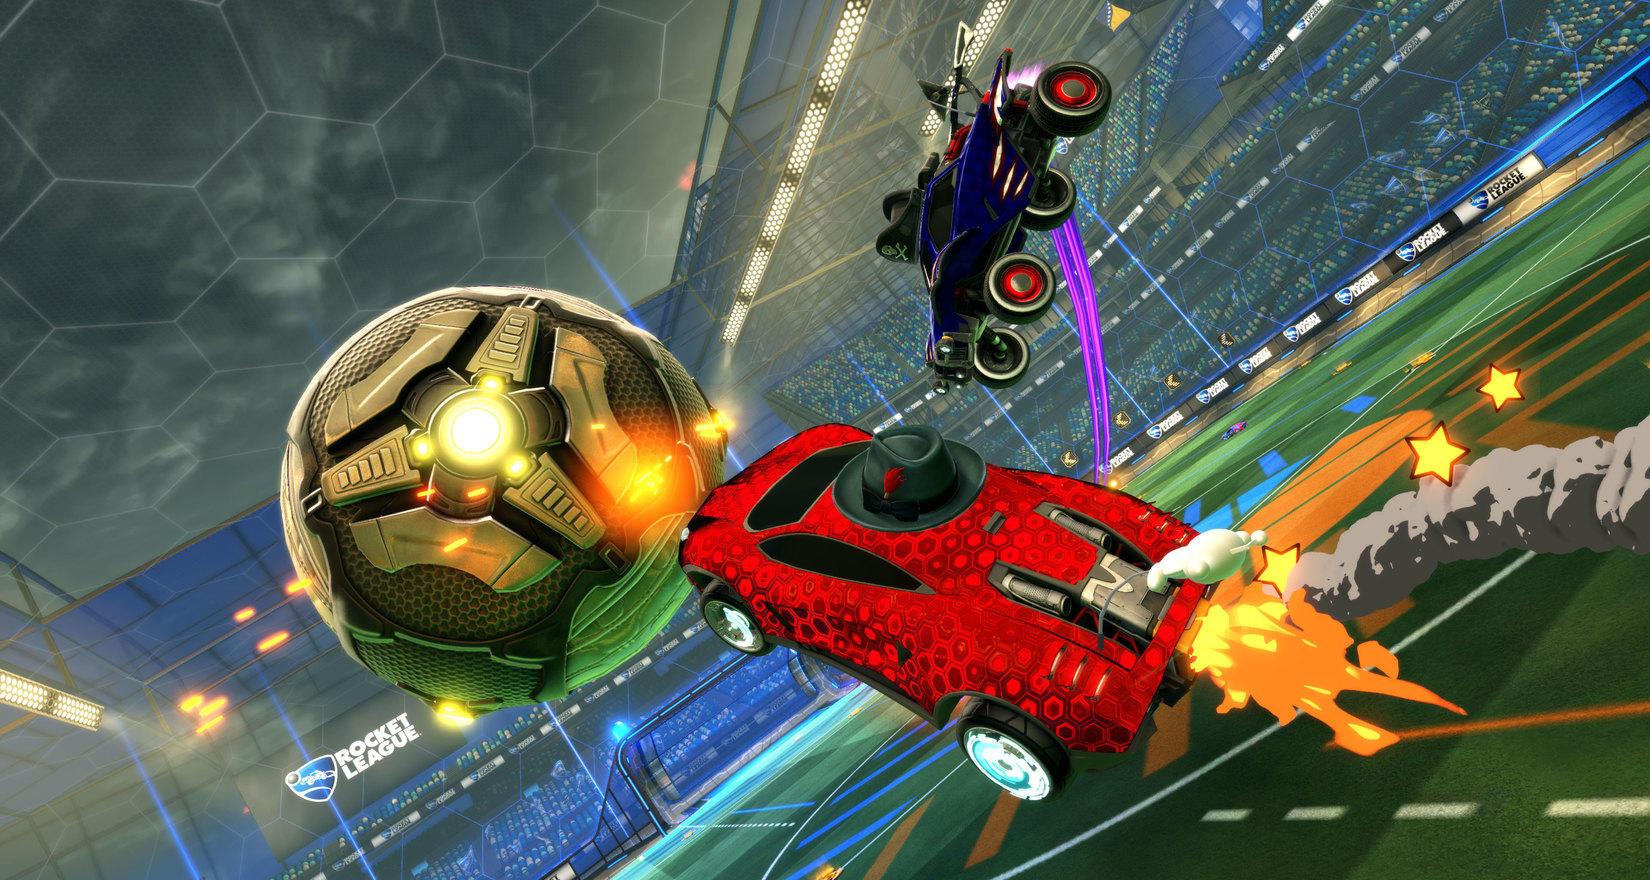 Rocket League: Rangliste - so funktioniert das Ranking